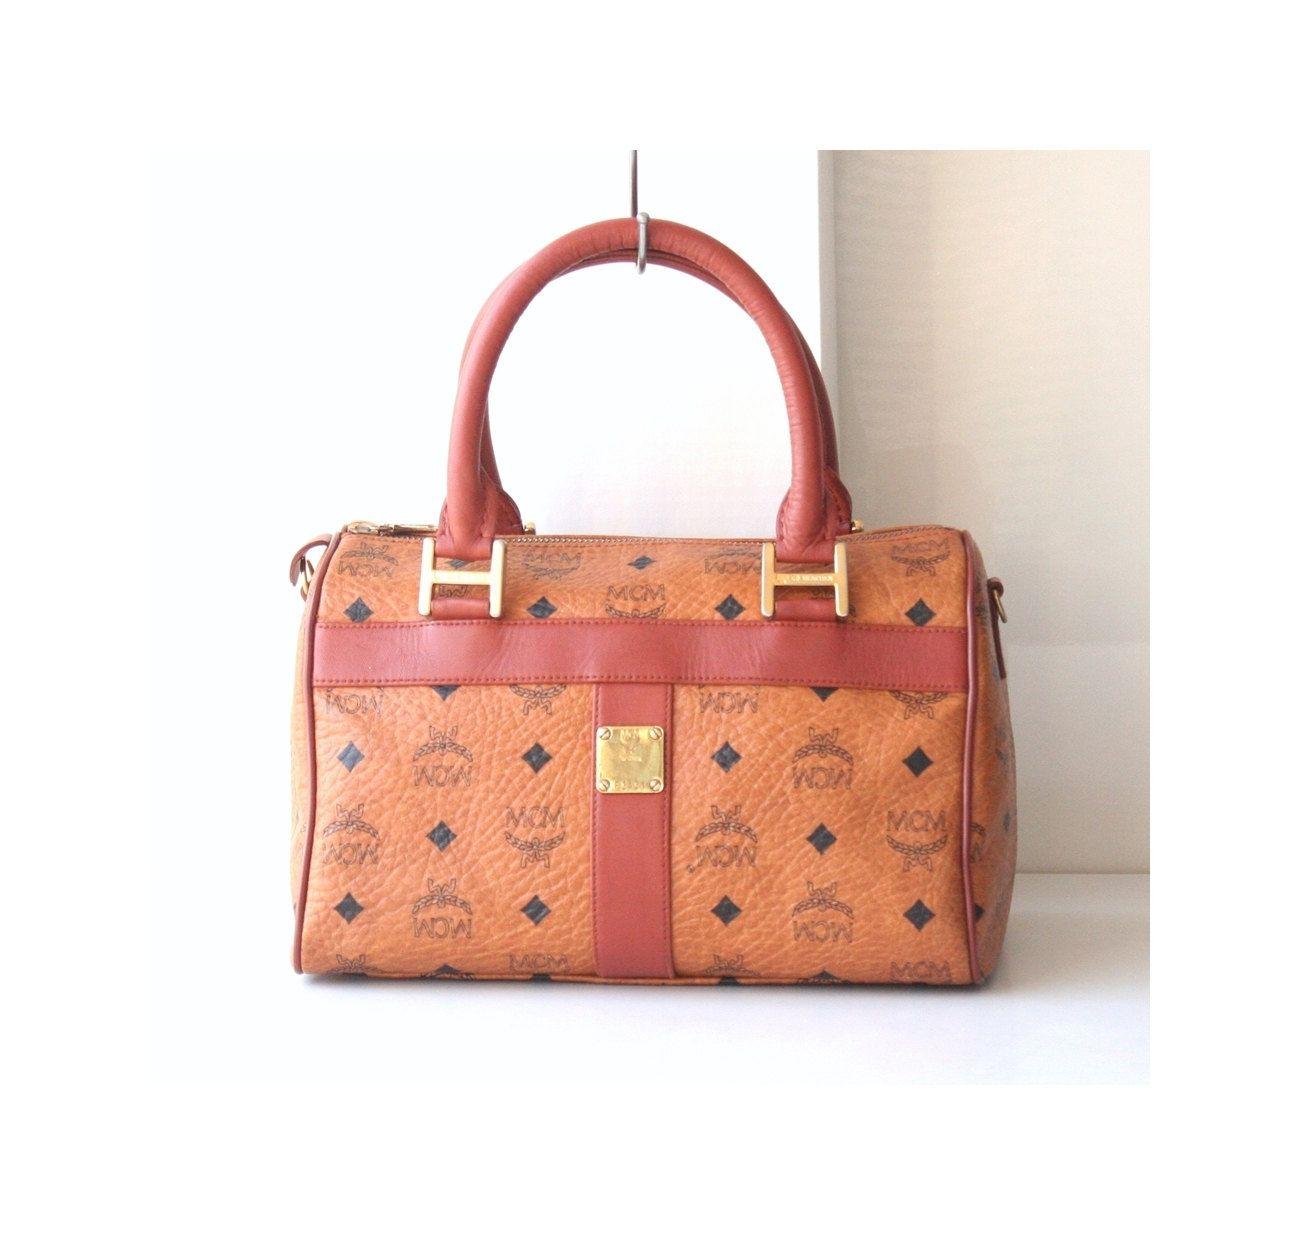 051ab983e39 MCM Bags Visetos Cognac Brown Monogram Boston vintage authentic handbag  purse 80 s by hfvin on Etsy  mcm  visetos  cognac  brown  handbag  monogram   vintage ...